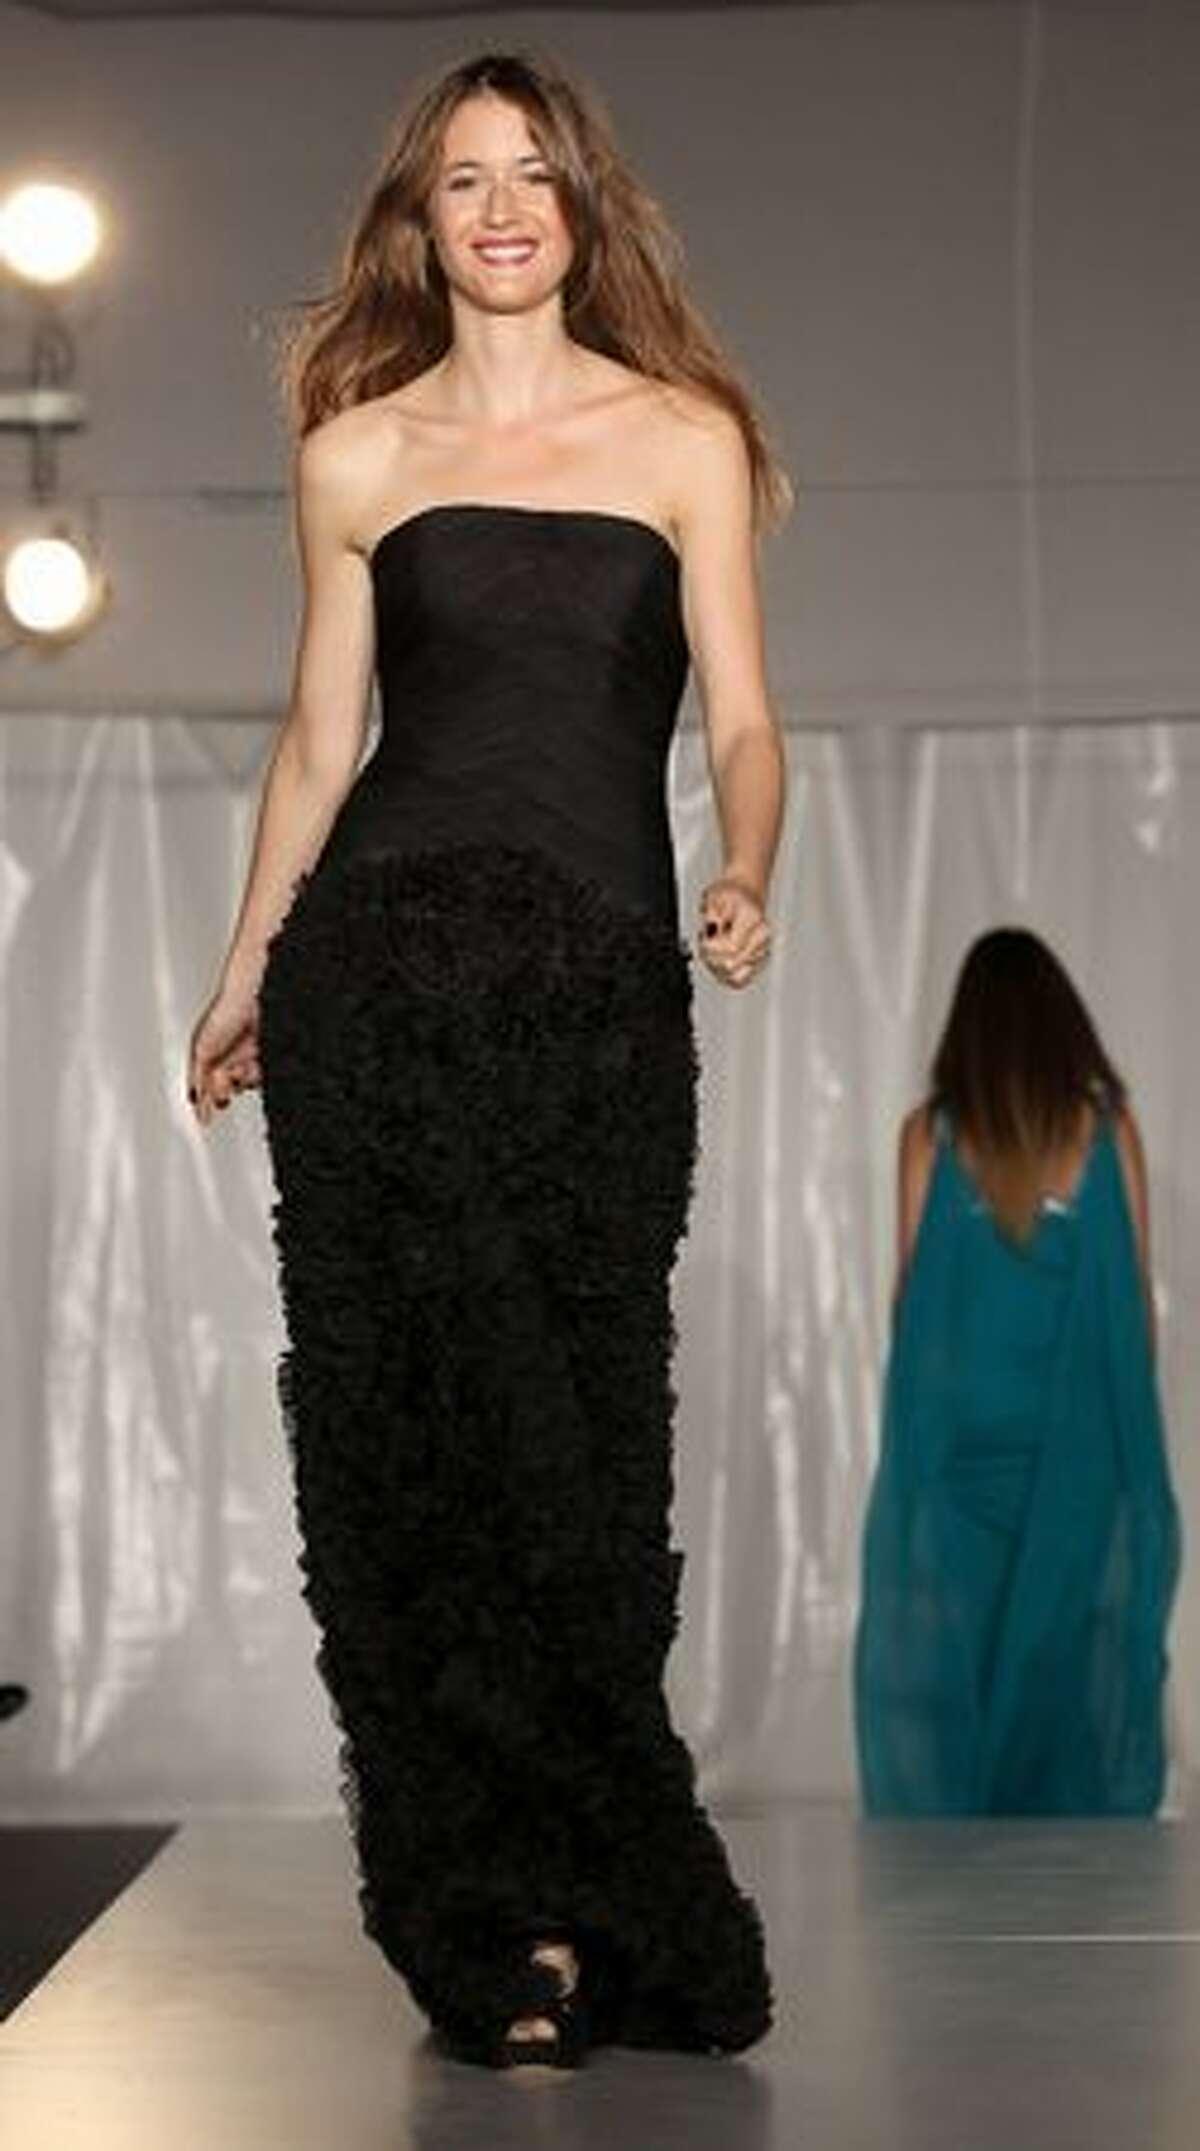 Susanna Gialori walks the runway dressing Pronovias during 'Italia - Milano, 150 Anni In Salute' - Charity Gala held at Villa Necchi in Milan, Italy.